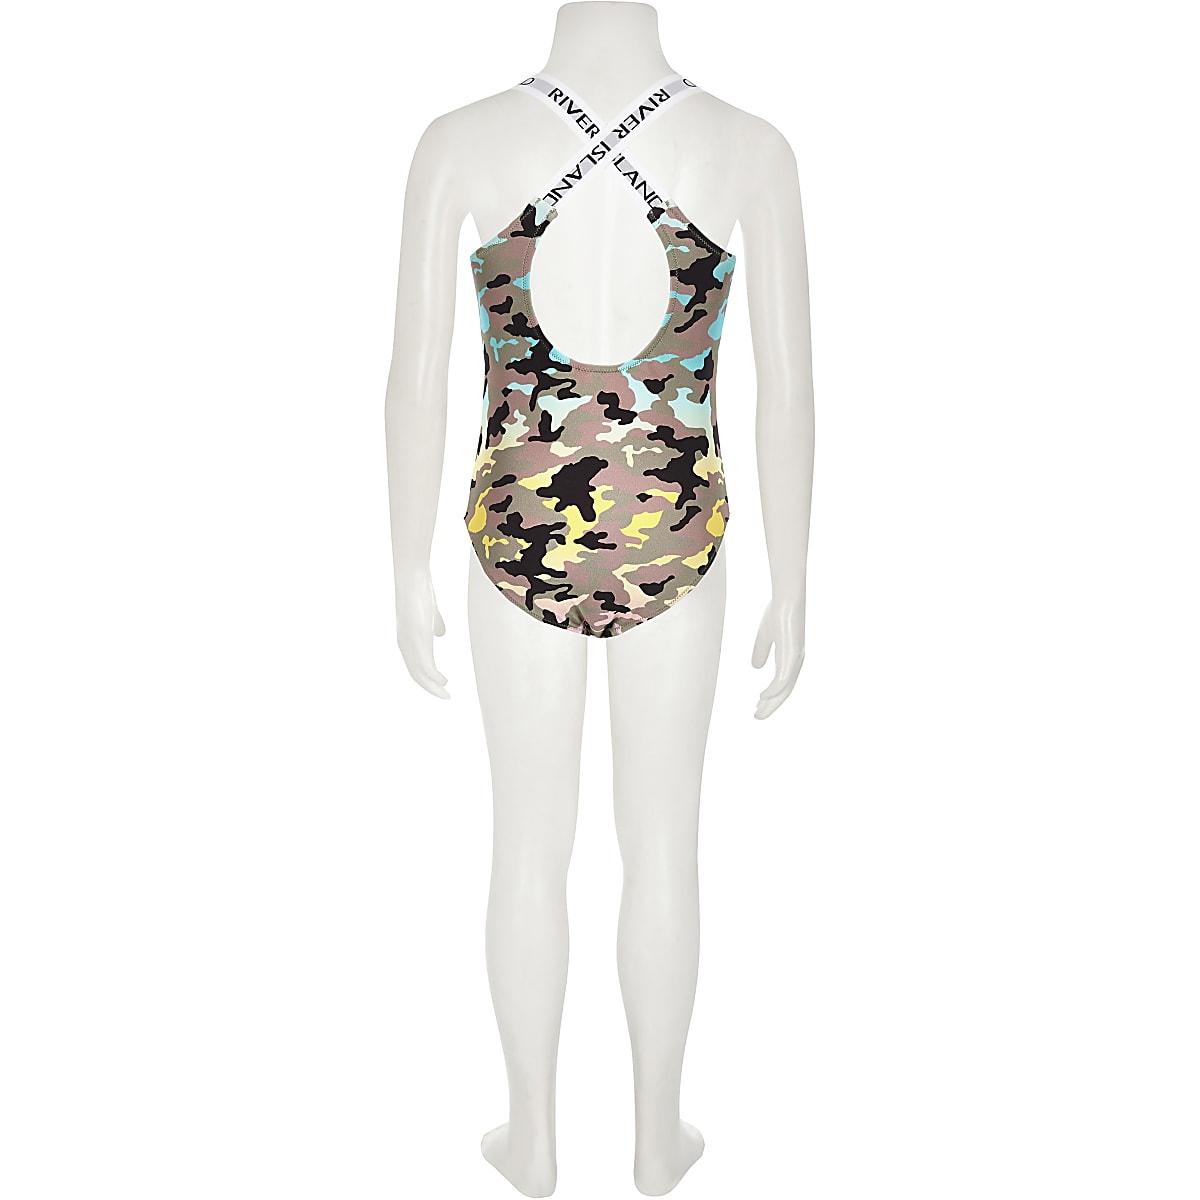 fa1782c48f90f Girls khaki camo print sequin swimsuit - Swimsuits - Swimwear ...